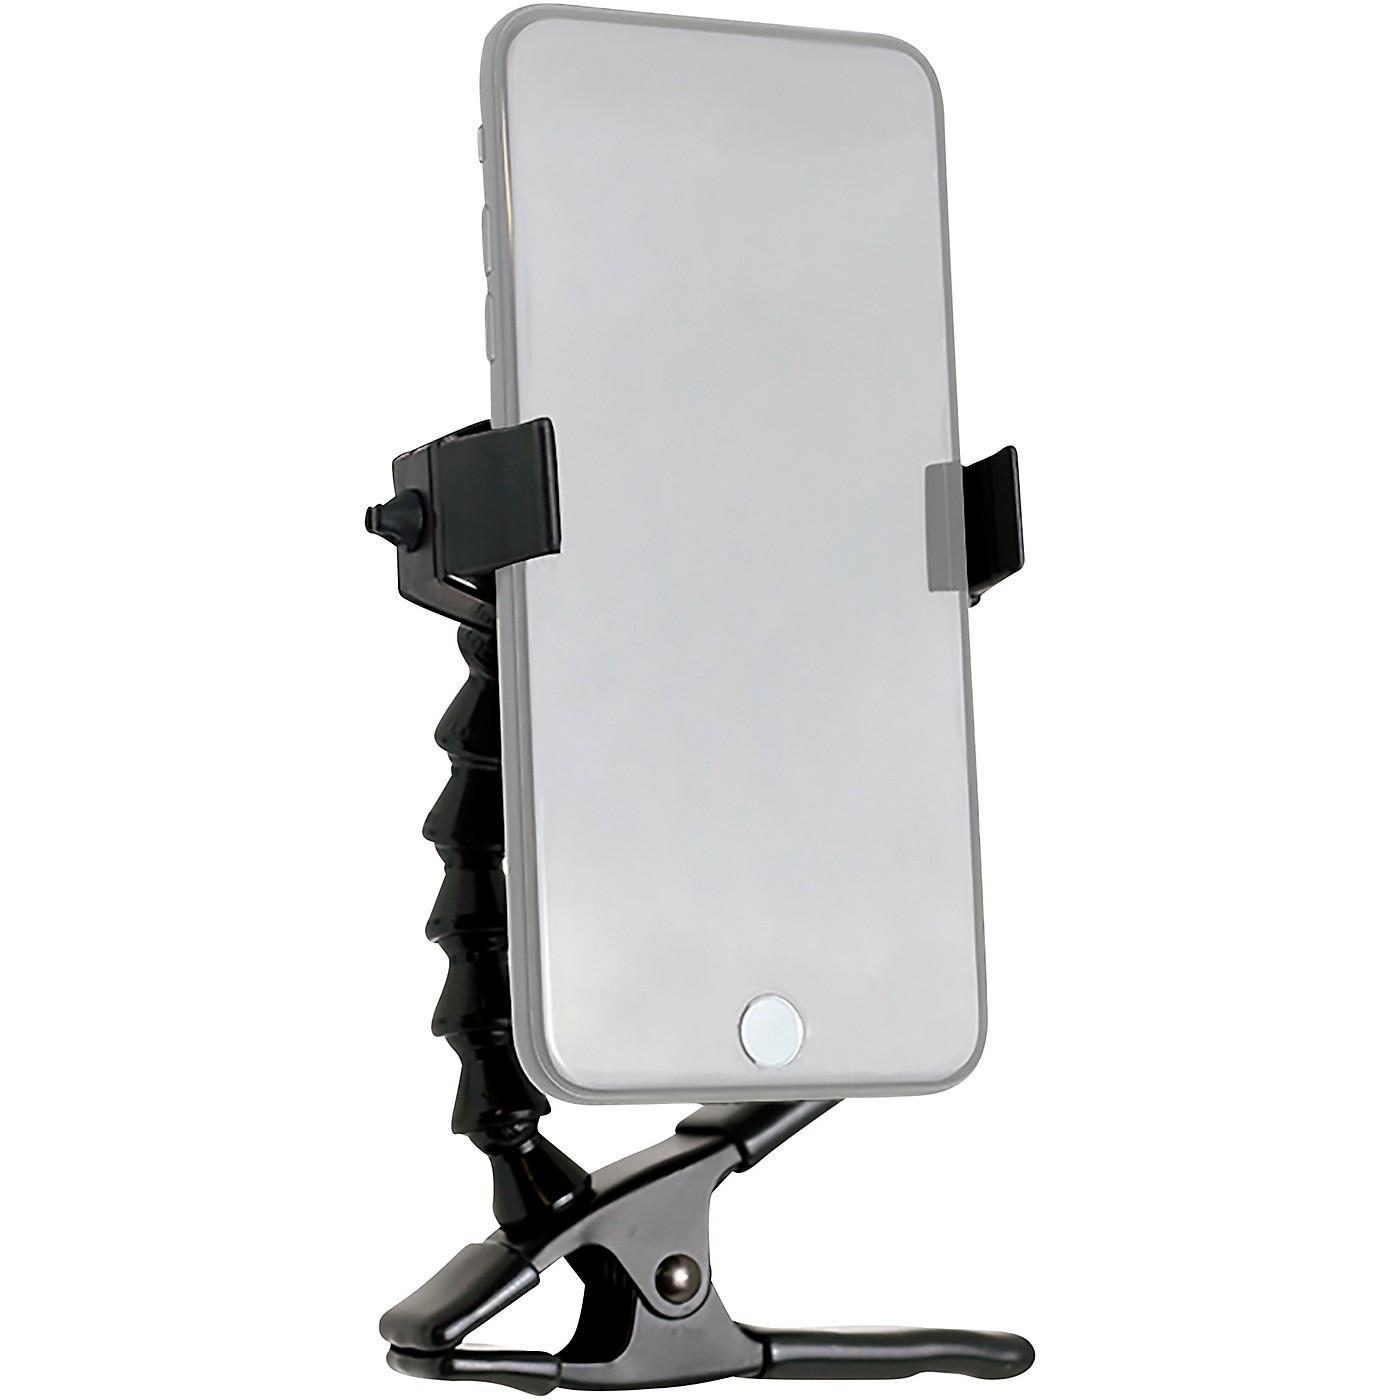 Stage Ninja FON-9-CB Phone Mount with Clamp Base thumbnail